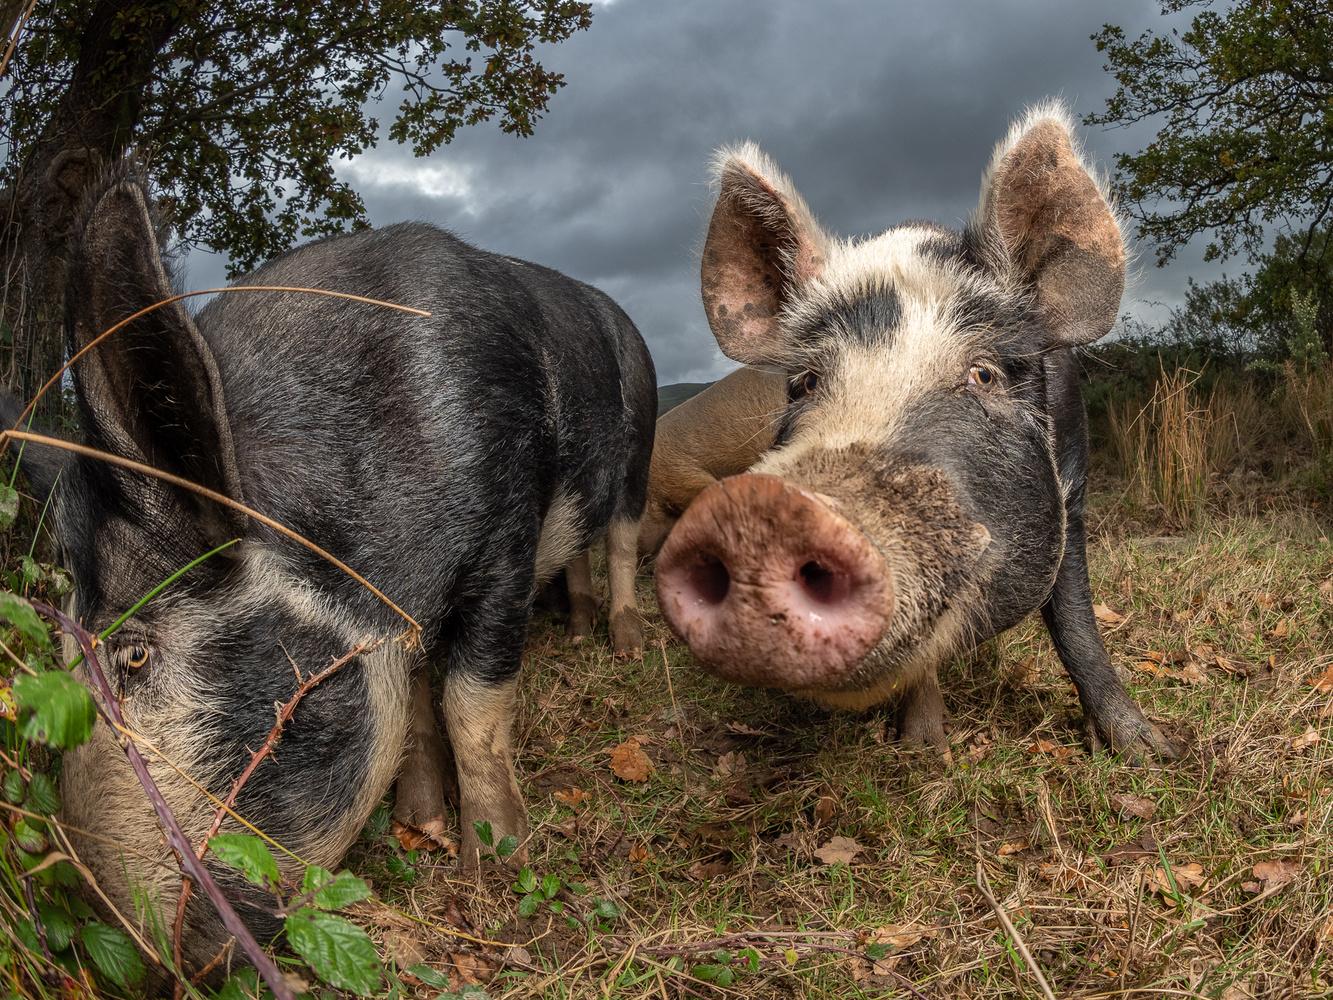 Welsh pigs by tomas doe